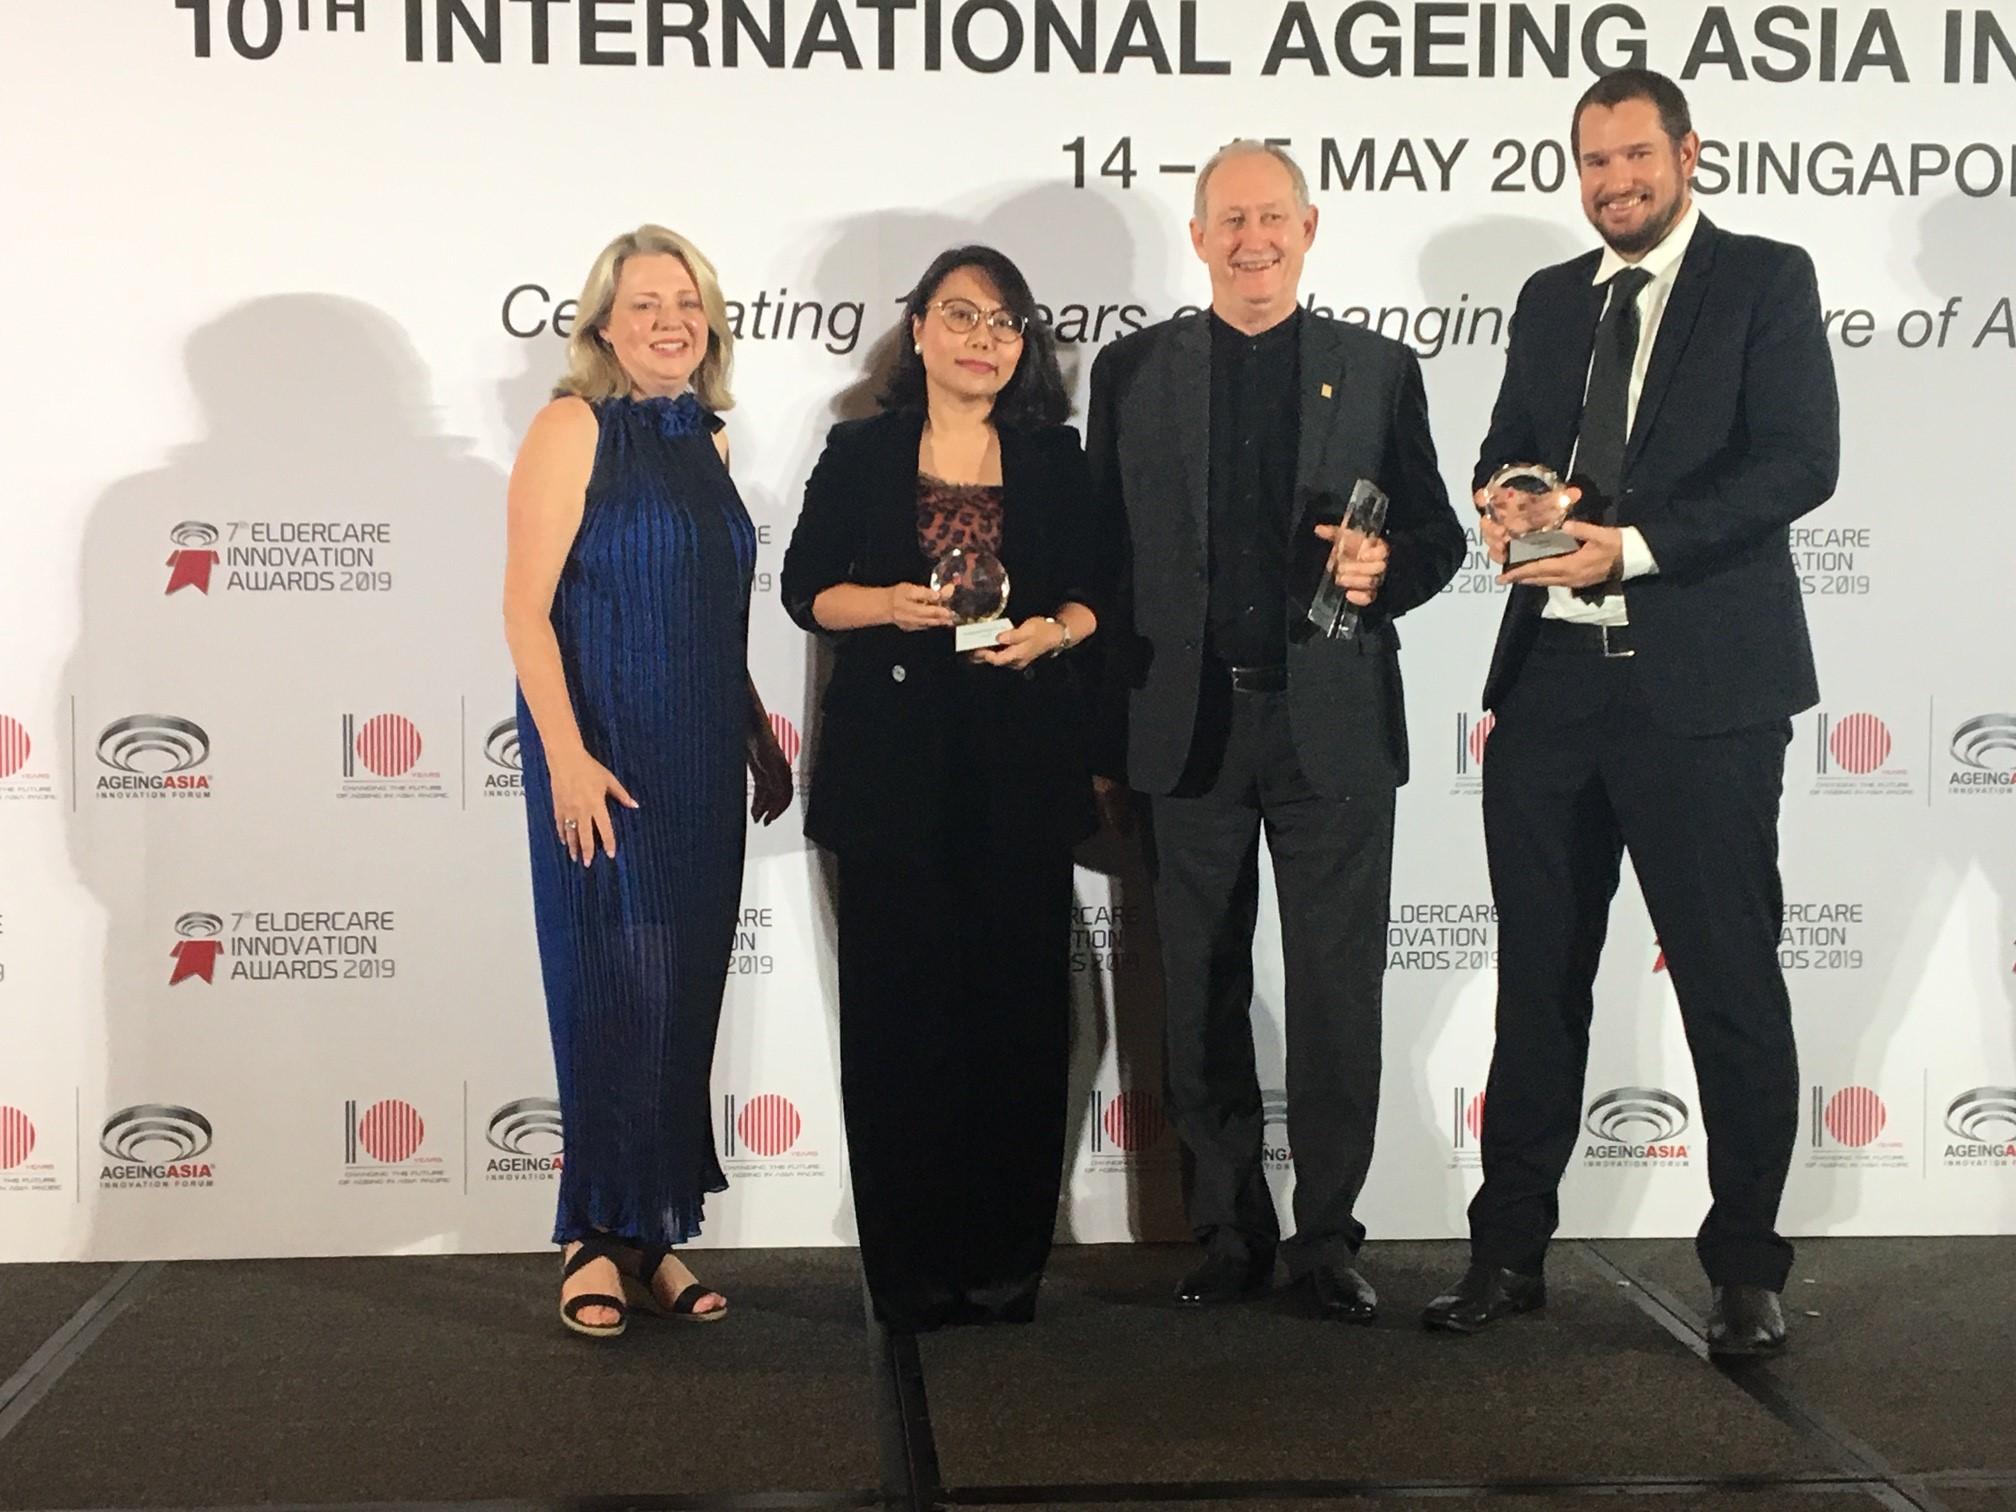 Julianne and award winners 3.jpg